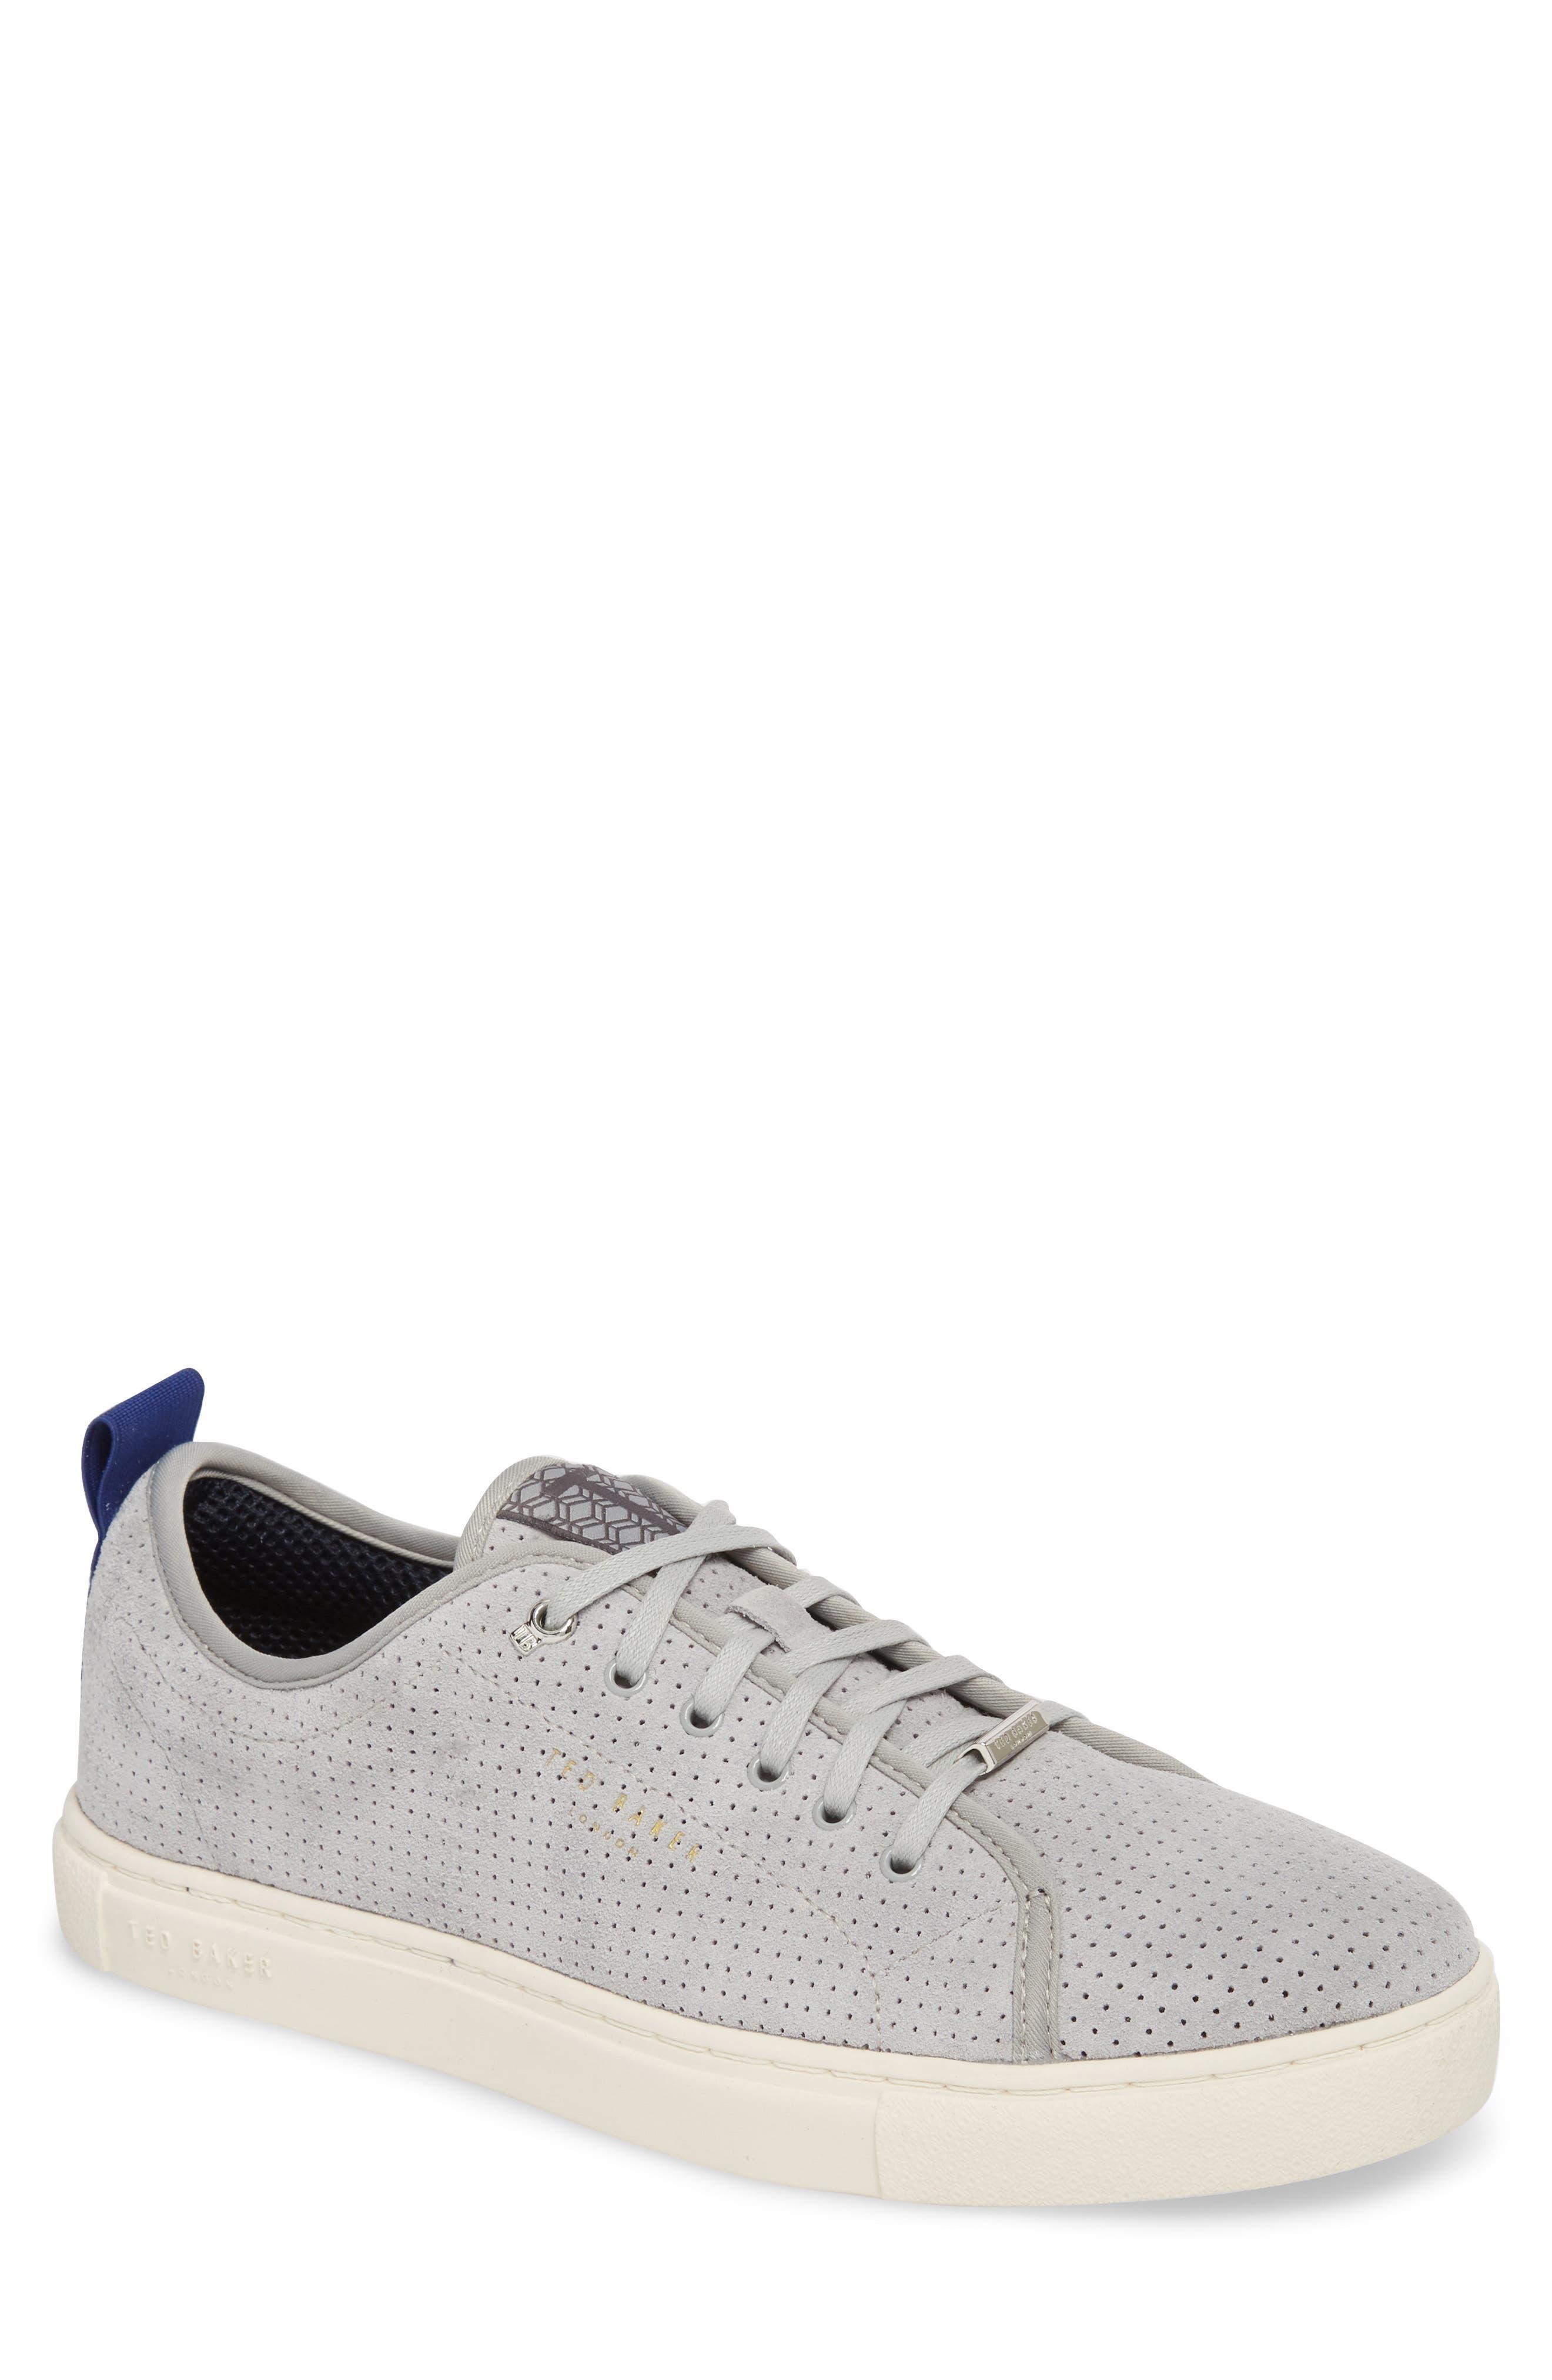 Kaliix Perforated Low Top Sneaker,                             Main thumbnail 1, color,                             070